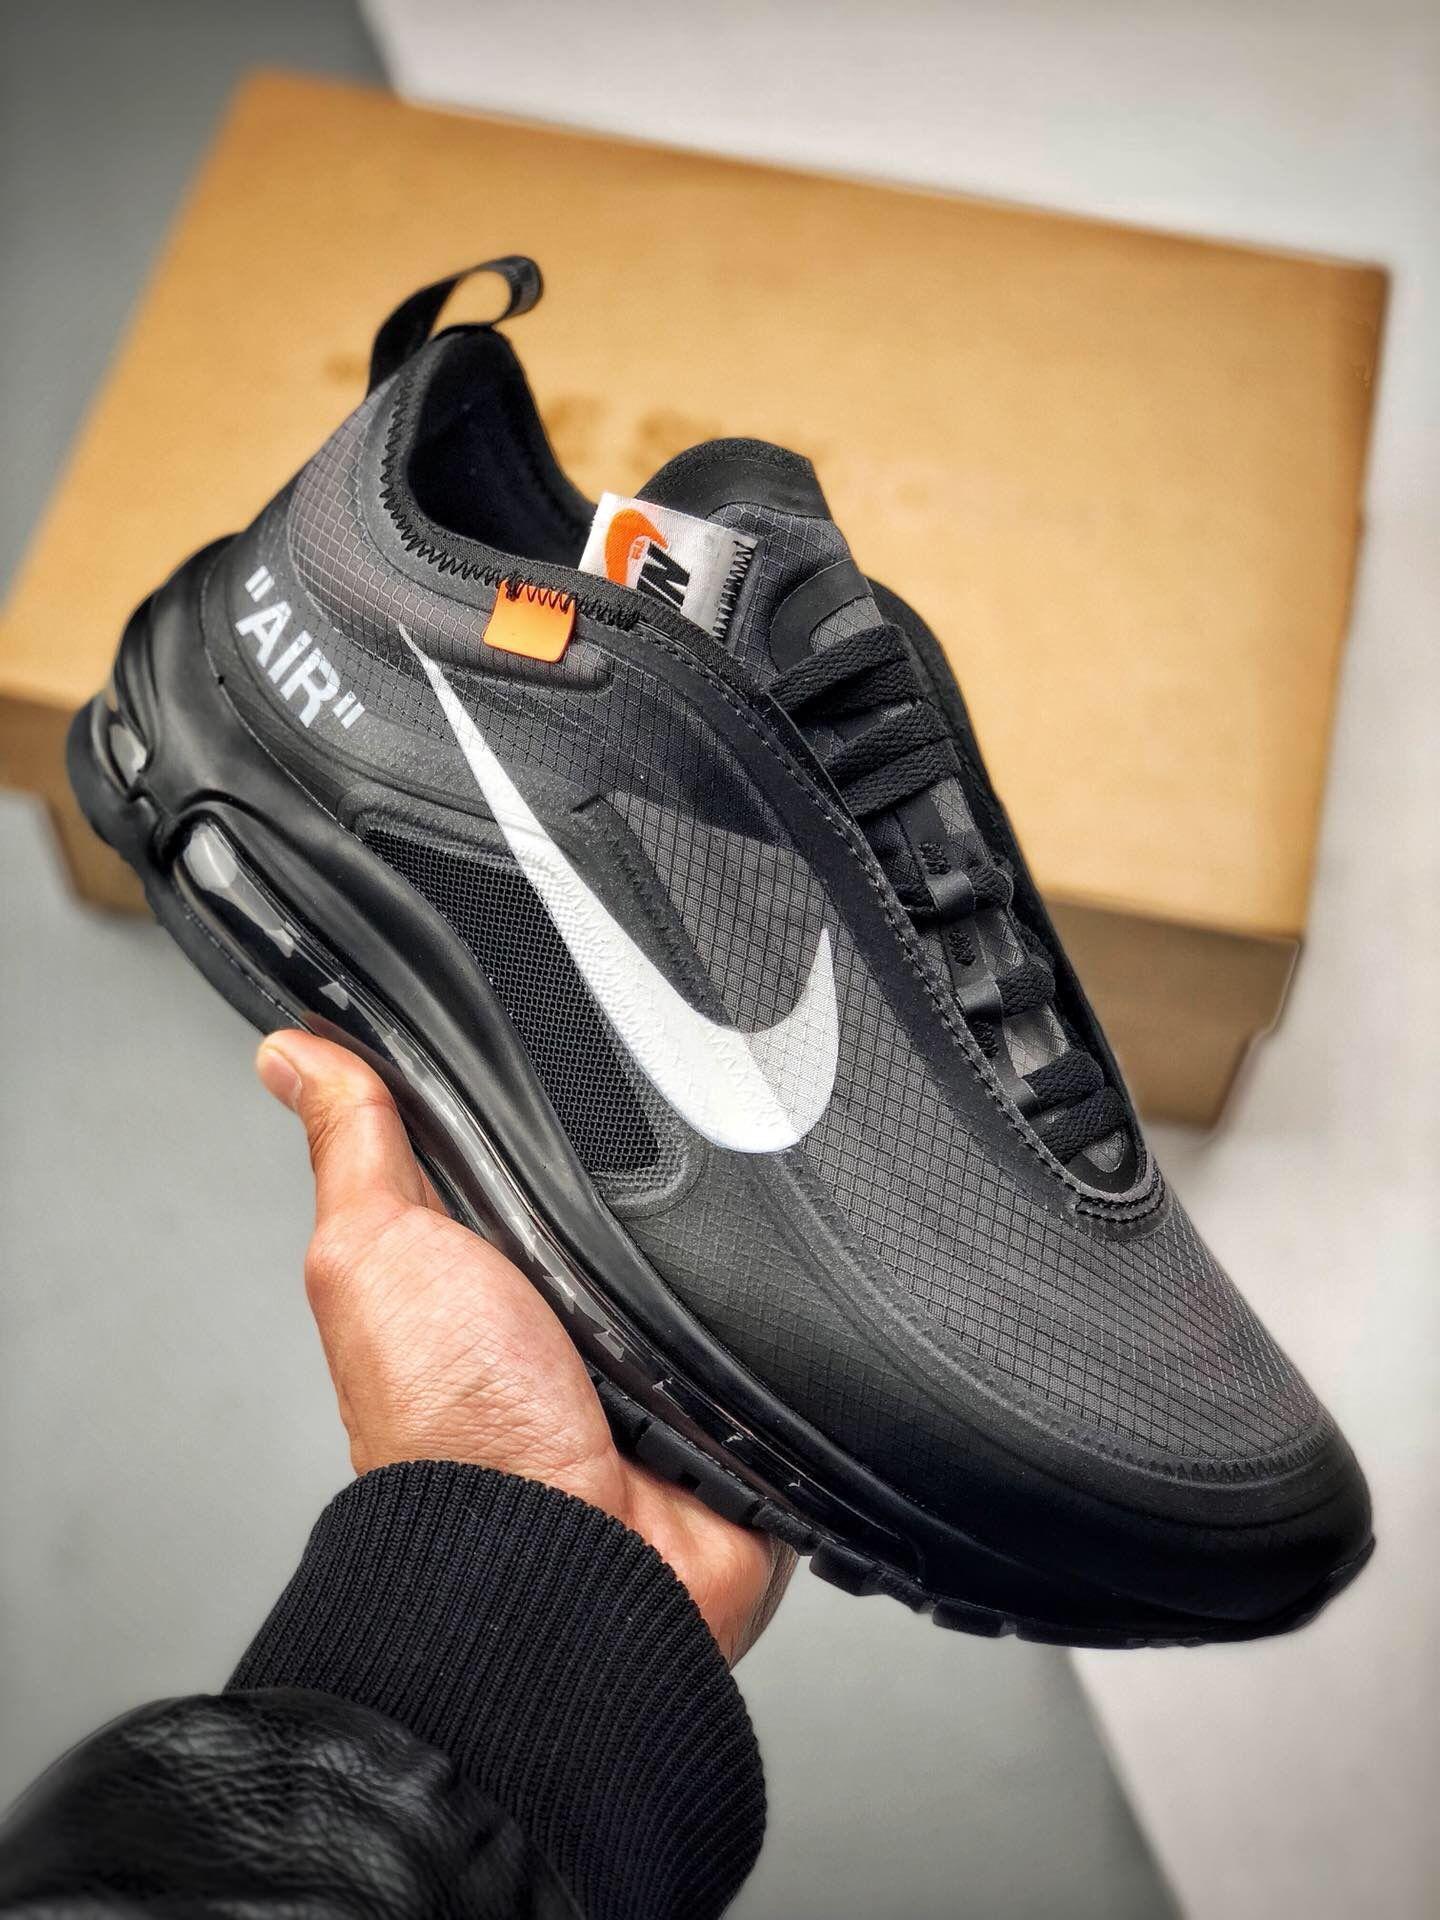 2018 Off White x Nike Air Max 97 OG Trainers In Black AJ4585 001